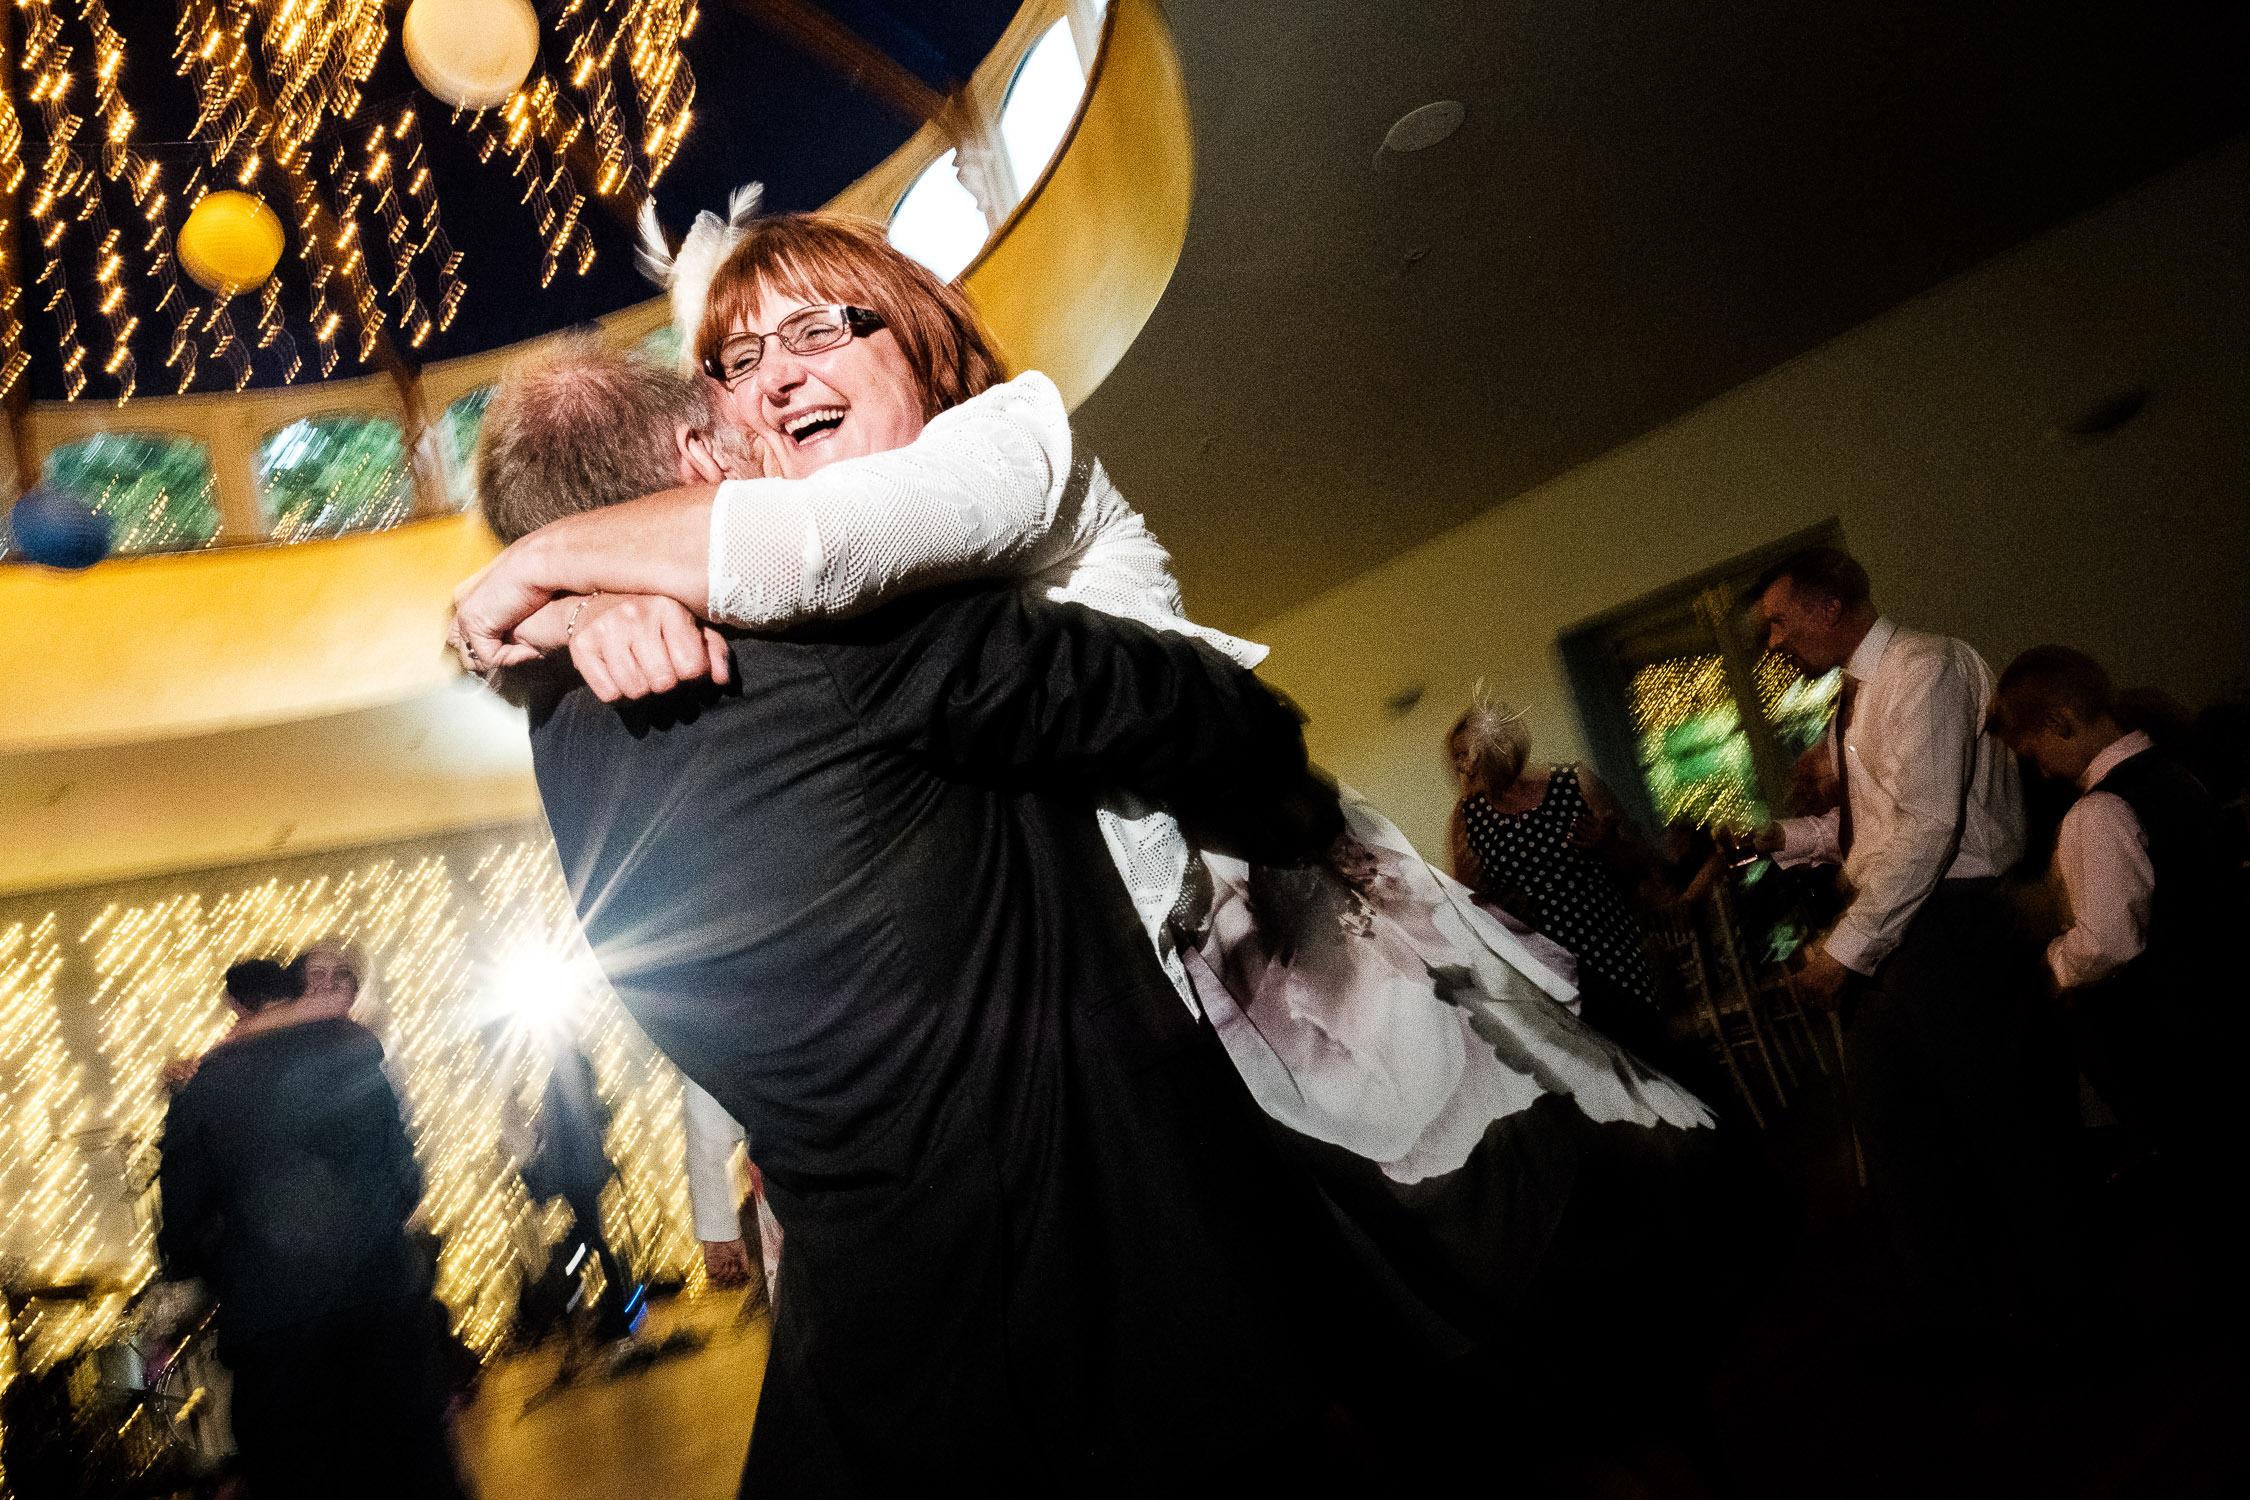 man picks up woman on dance floor